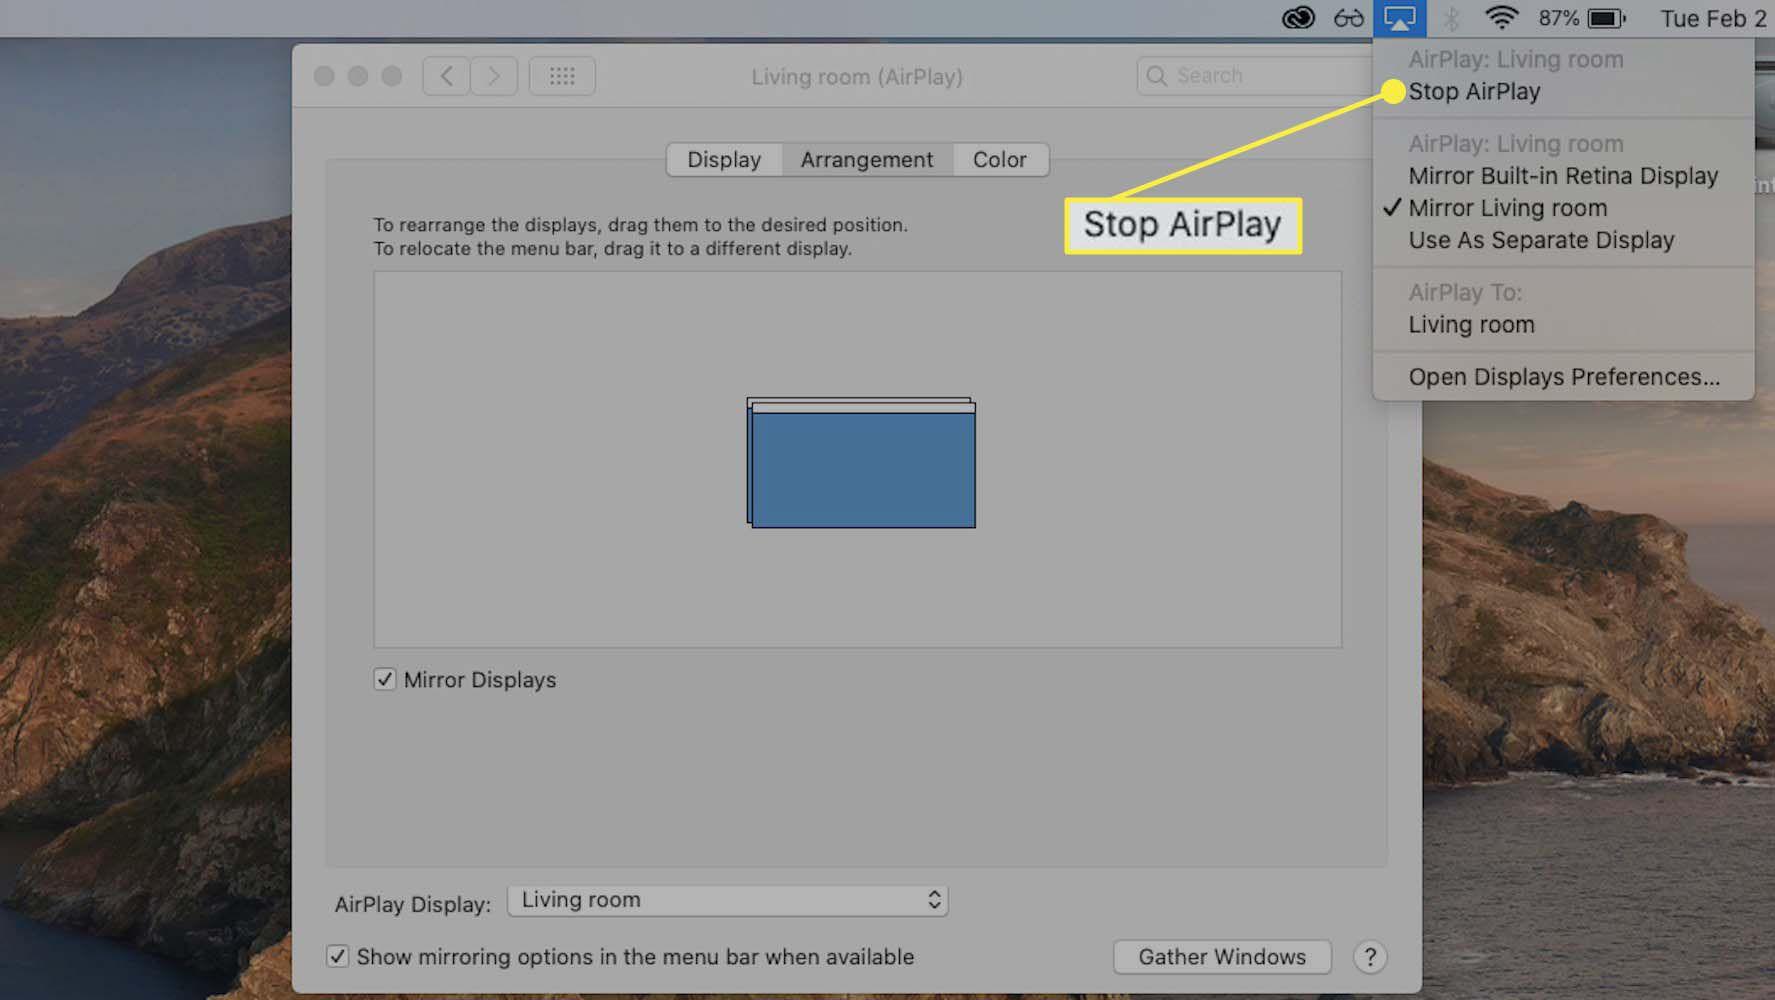 The Stop AirPlay menu item highlighted in the AirPlay menu bar menu.